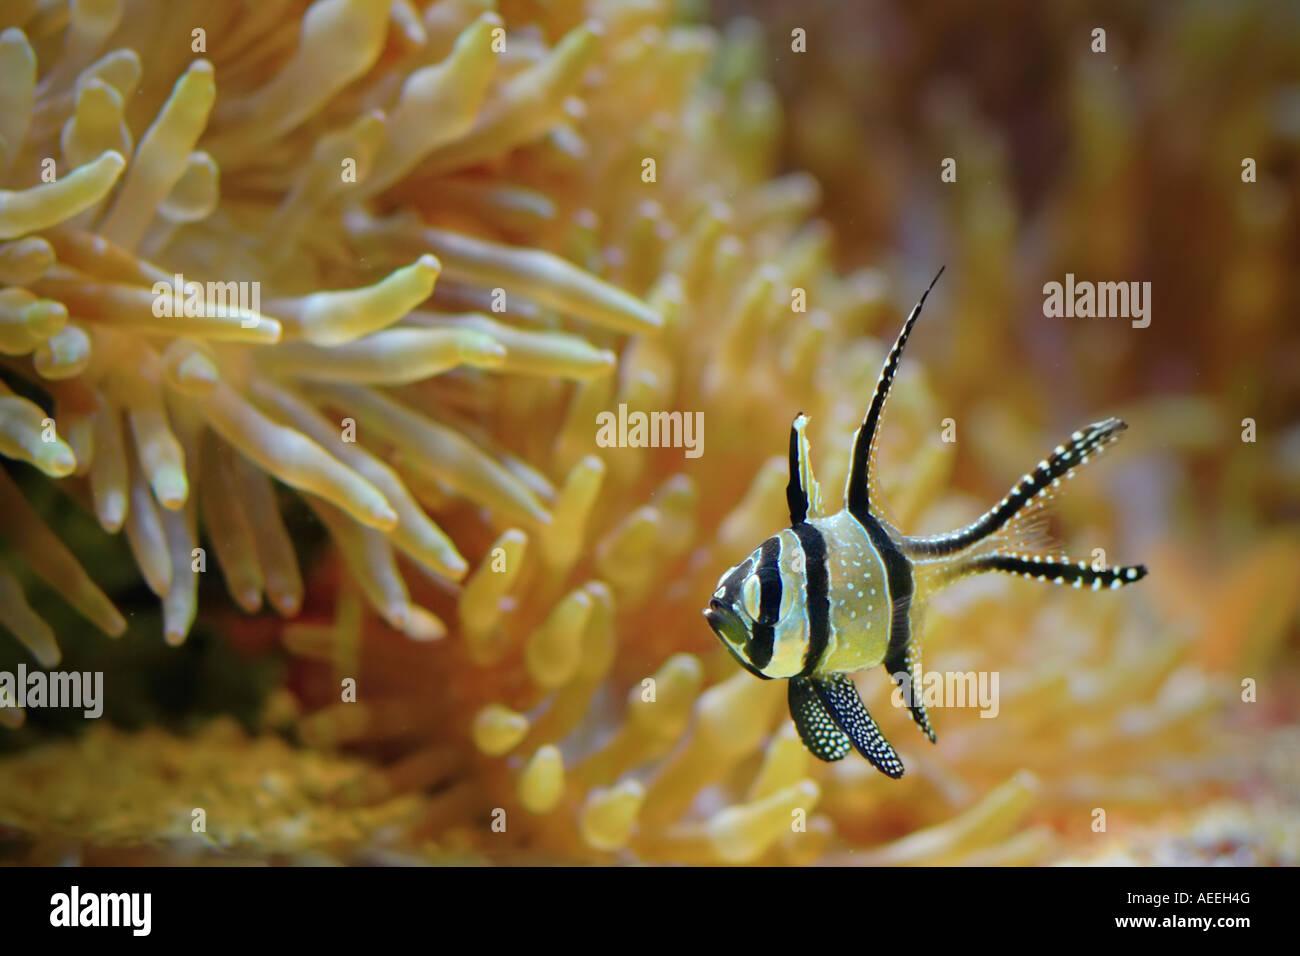 Exotic fish - Stock Image